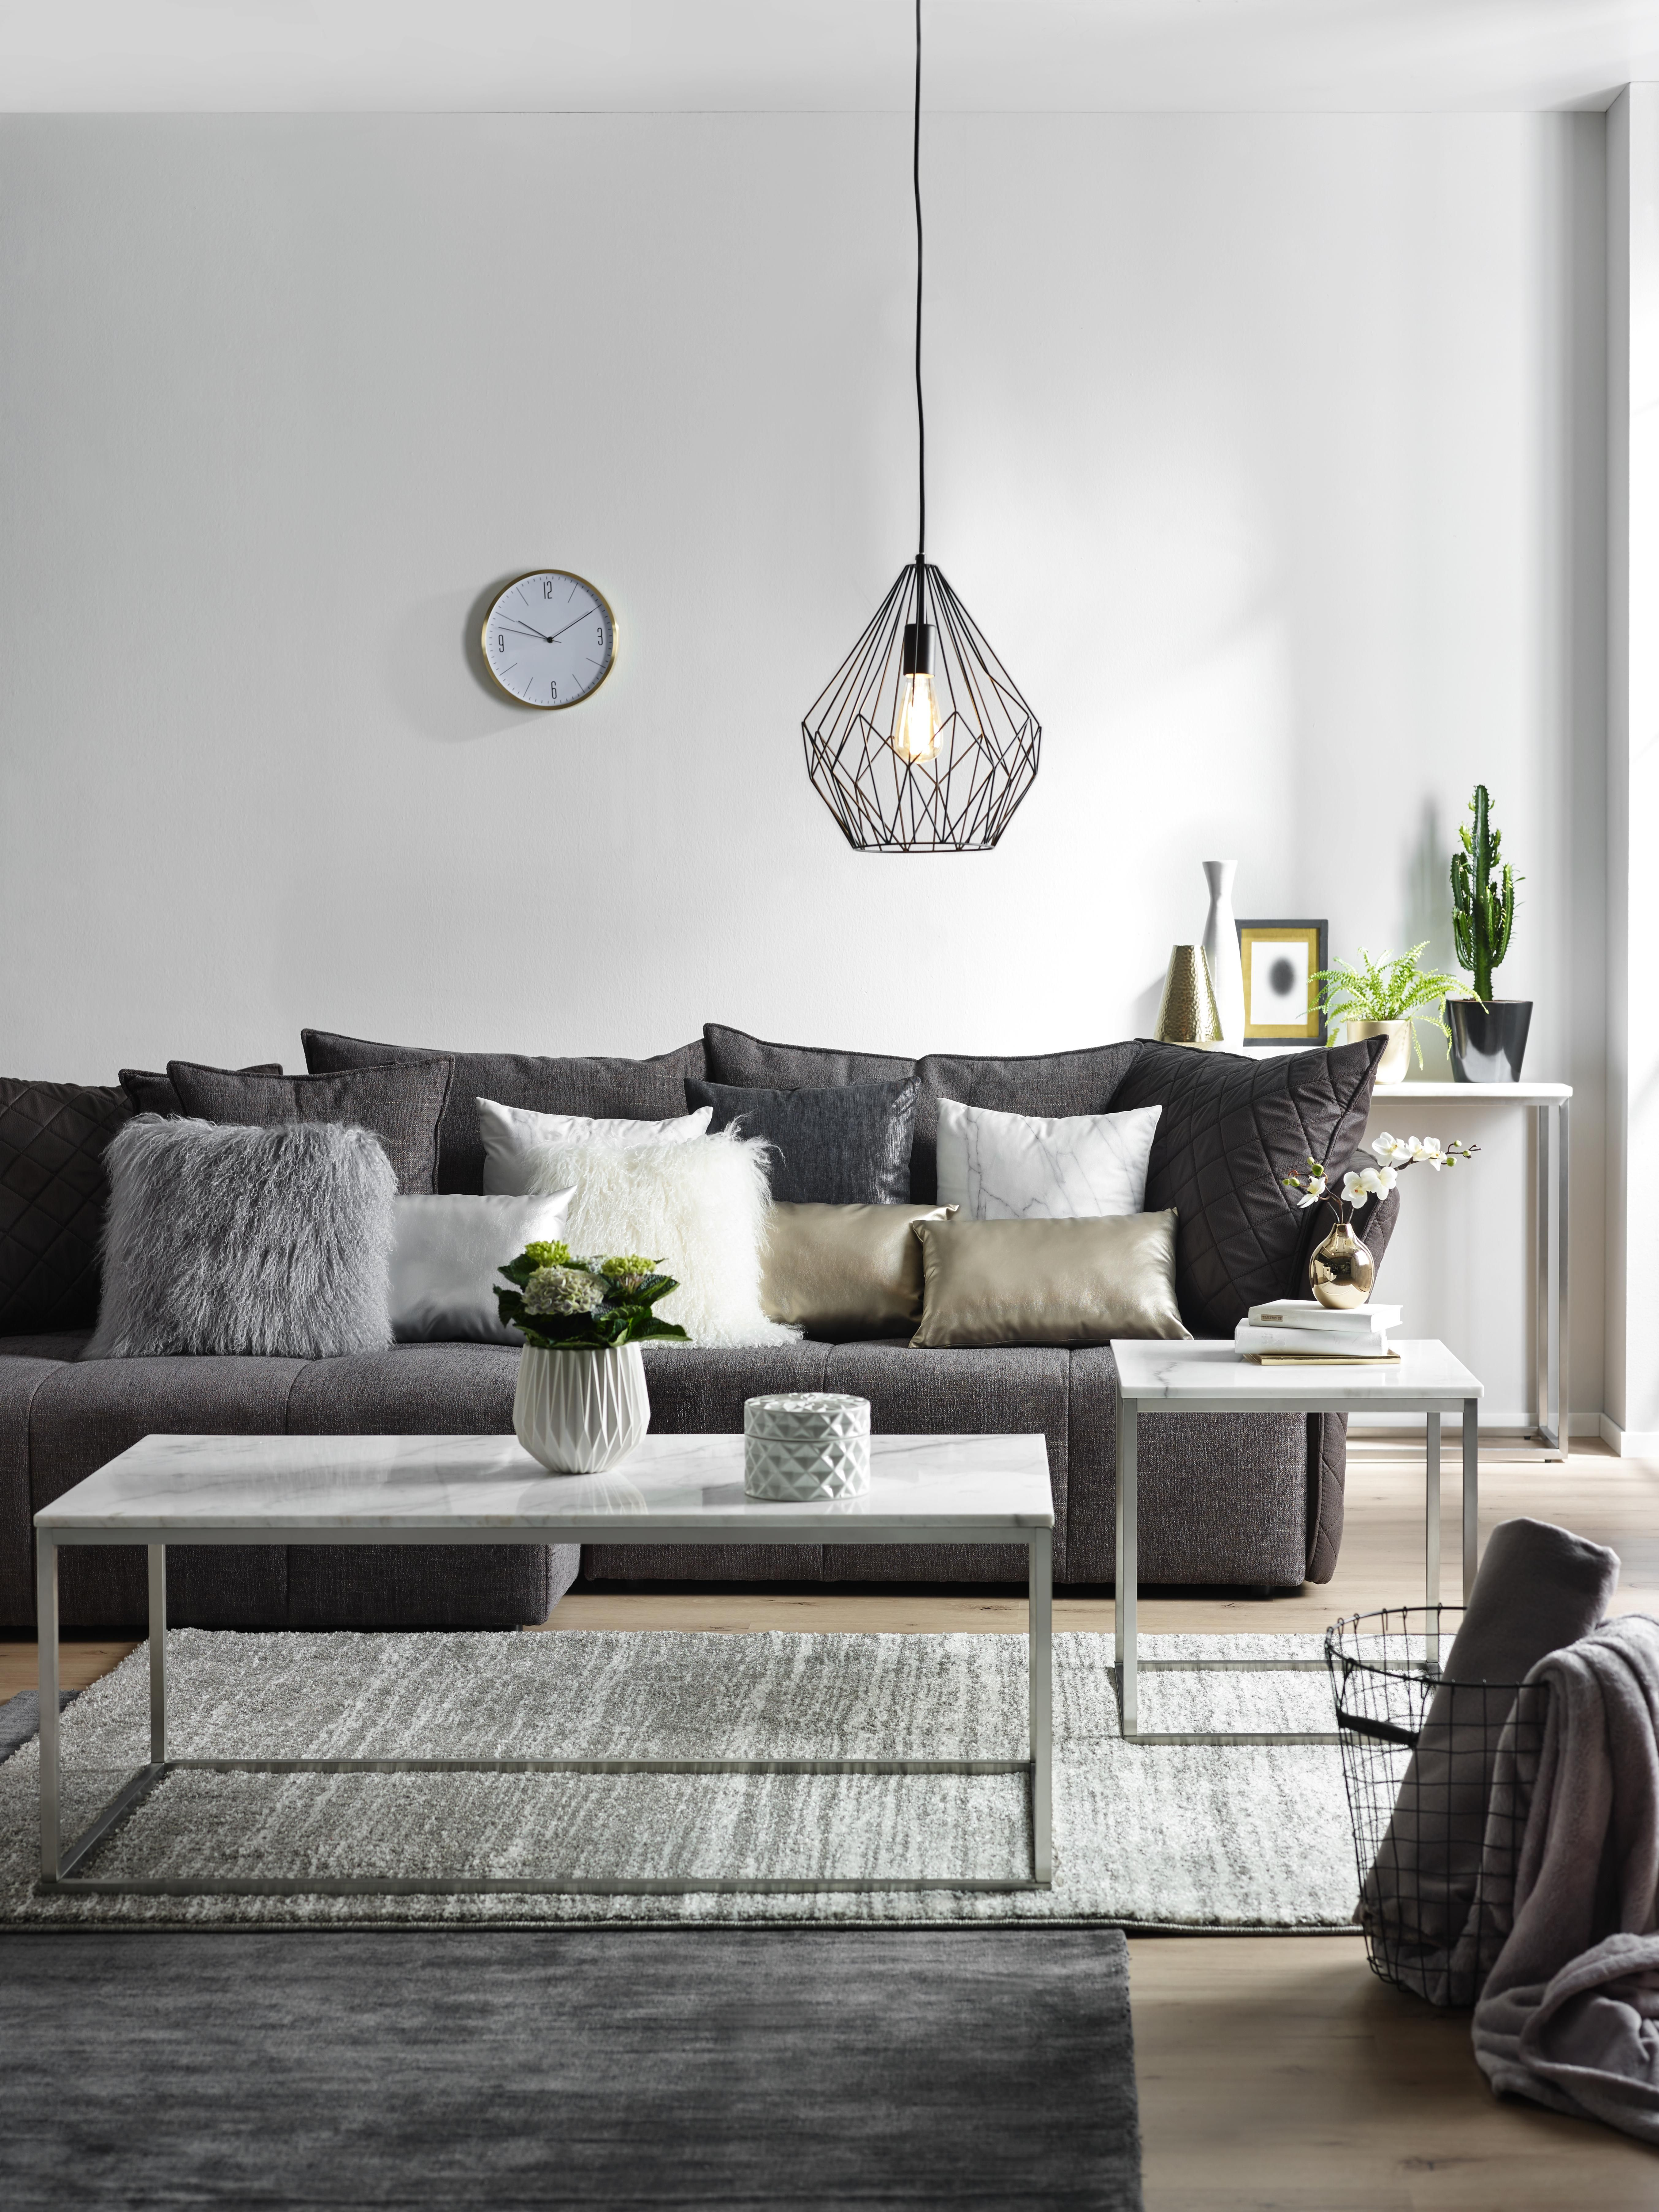 Image Result For Graue Couch Kombinieren